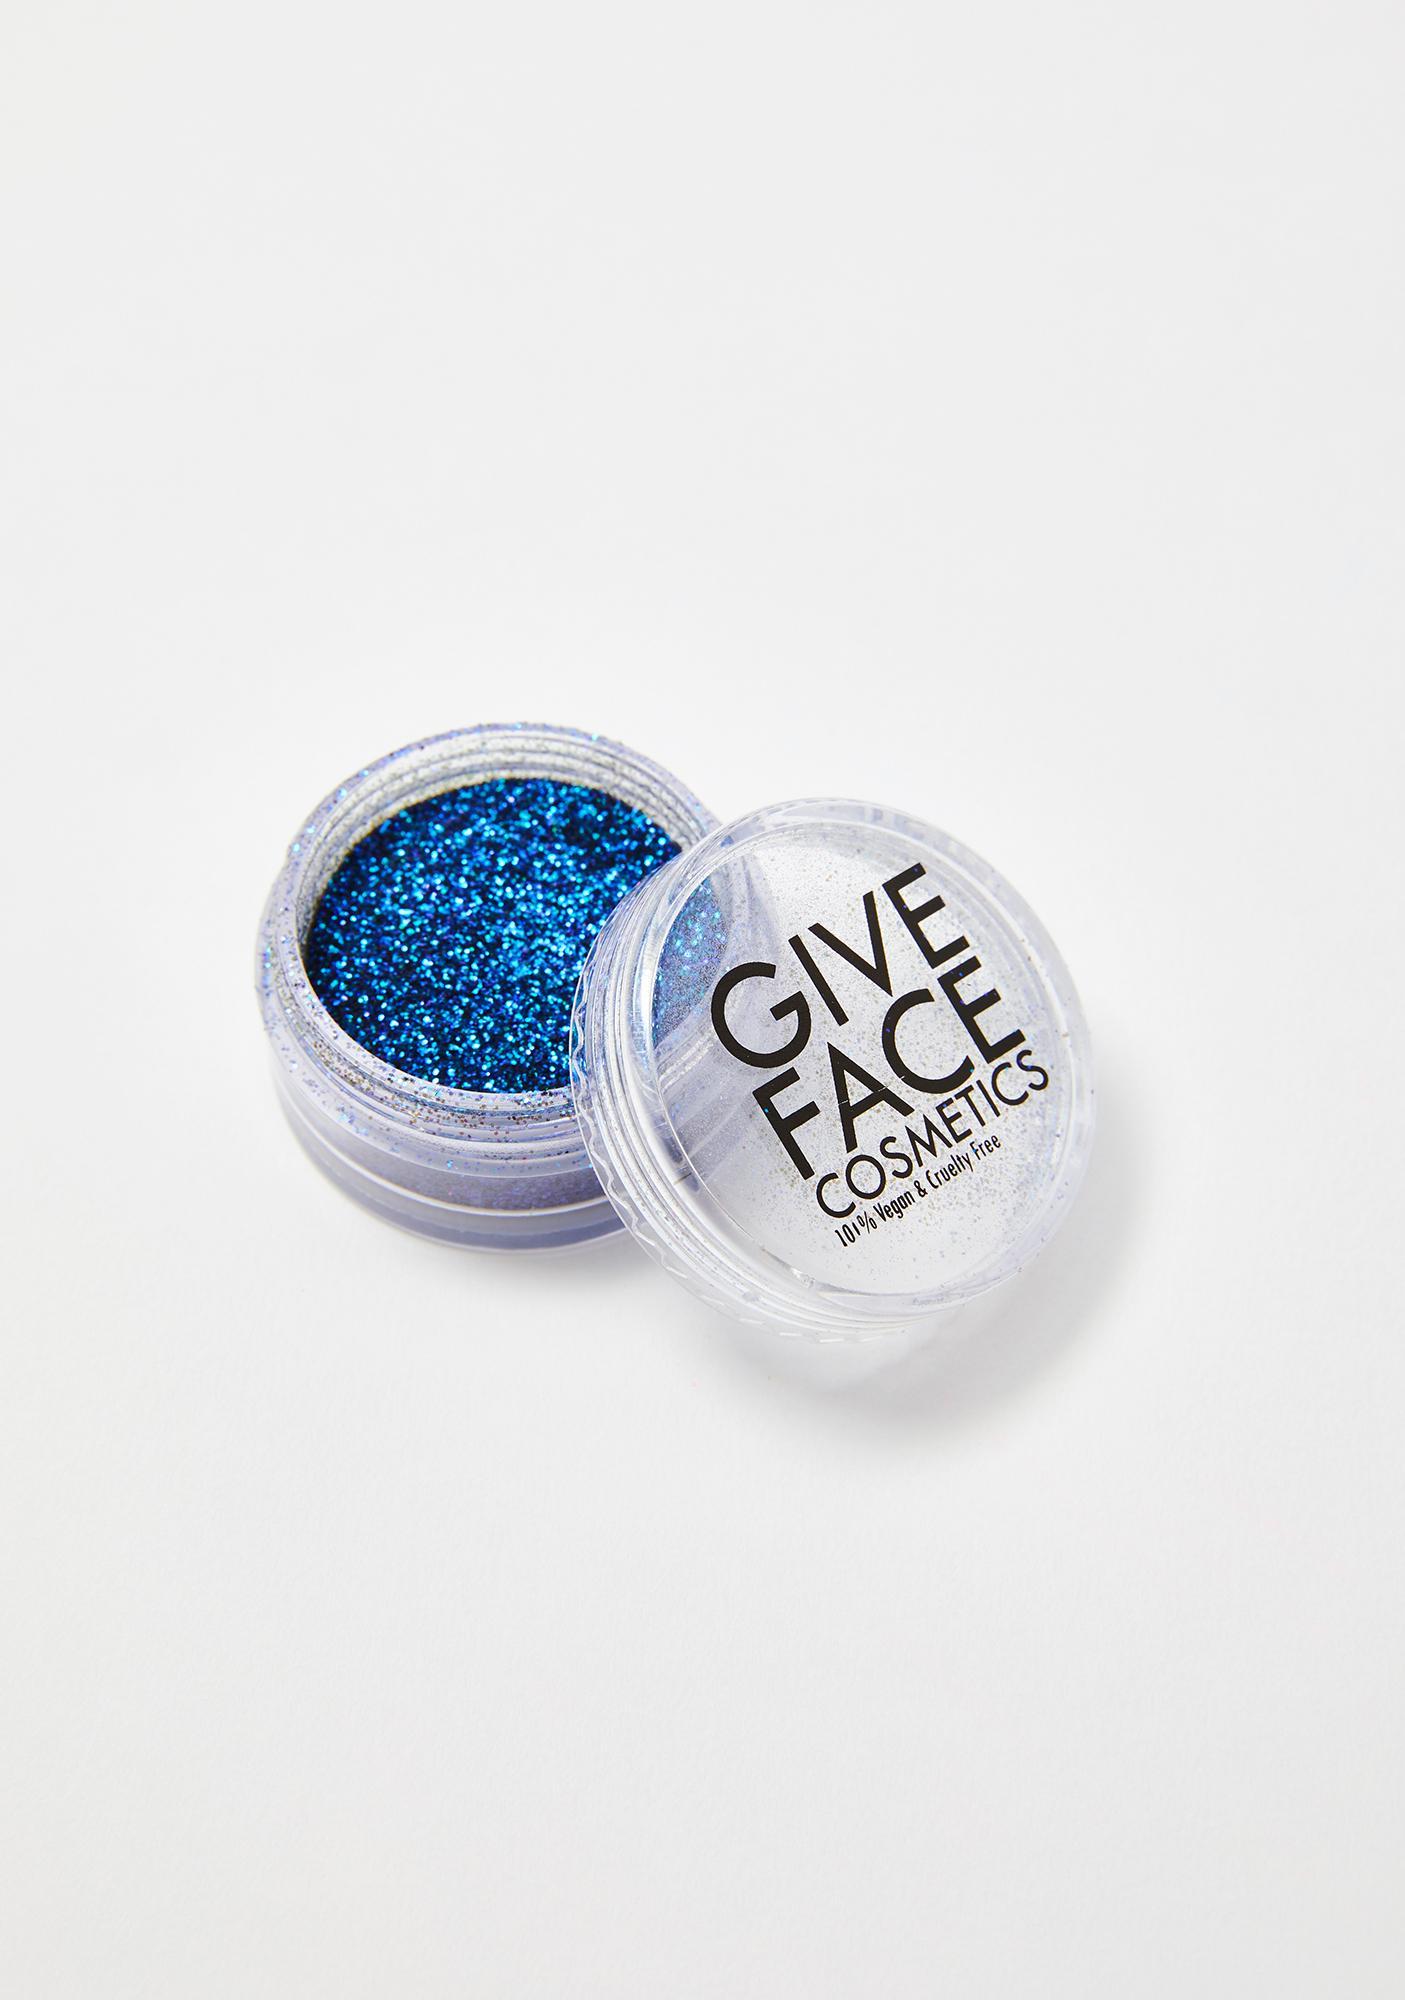 Give Face Cosmetics Elixir Glitter